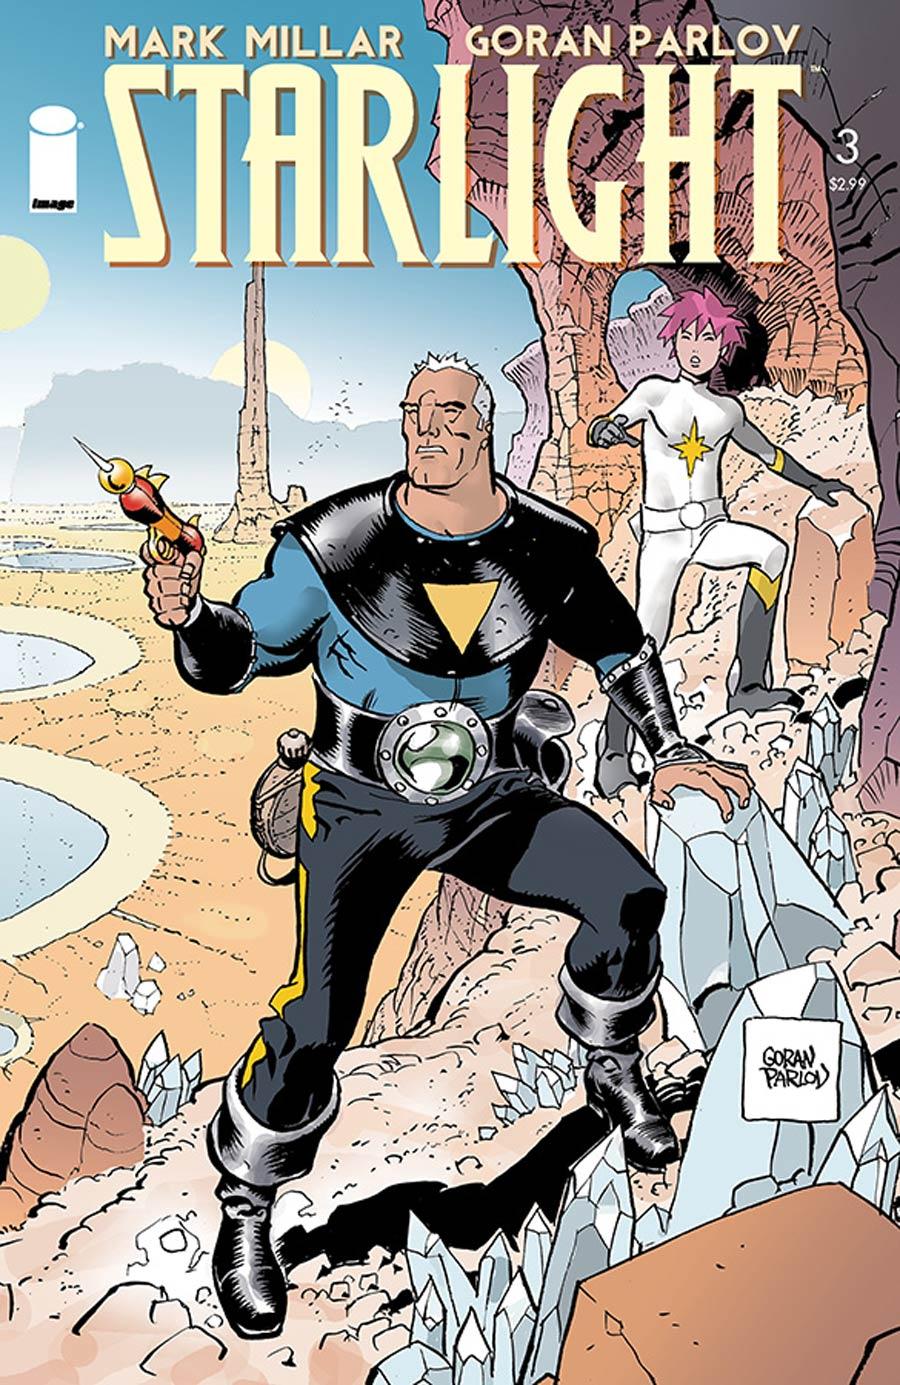 Starlight #3 Cover A Goran Parlov